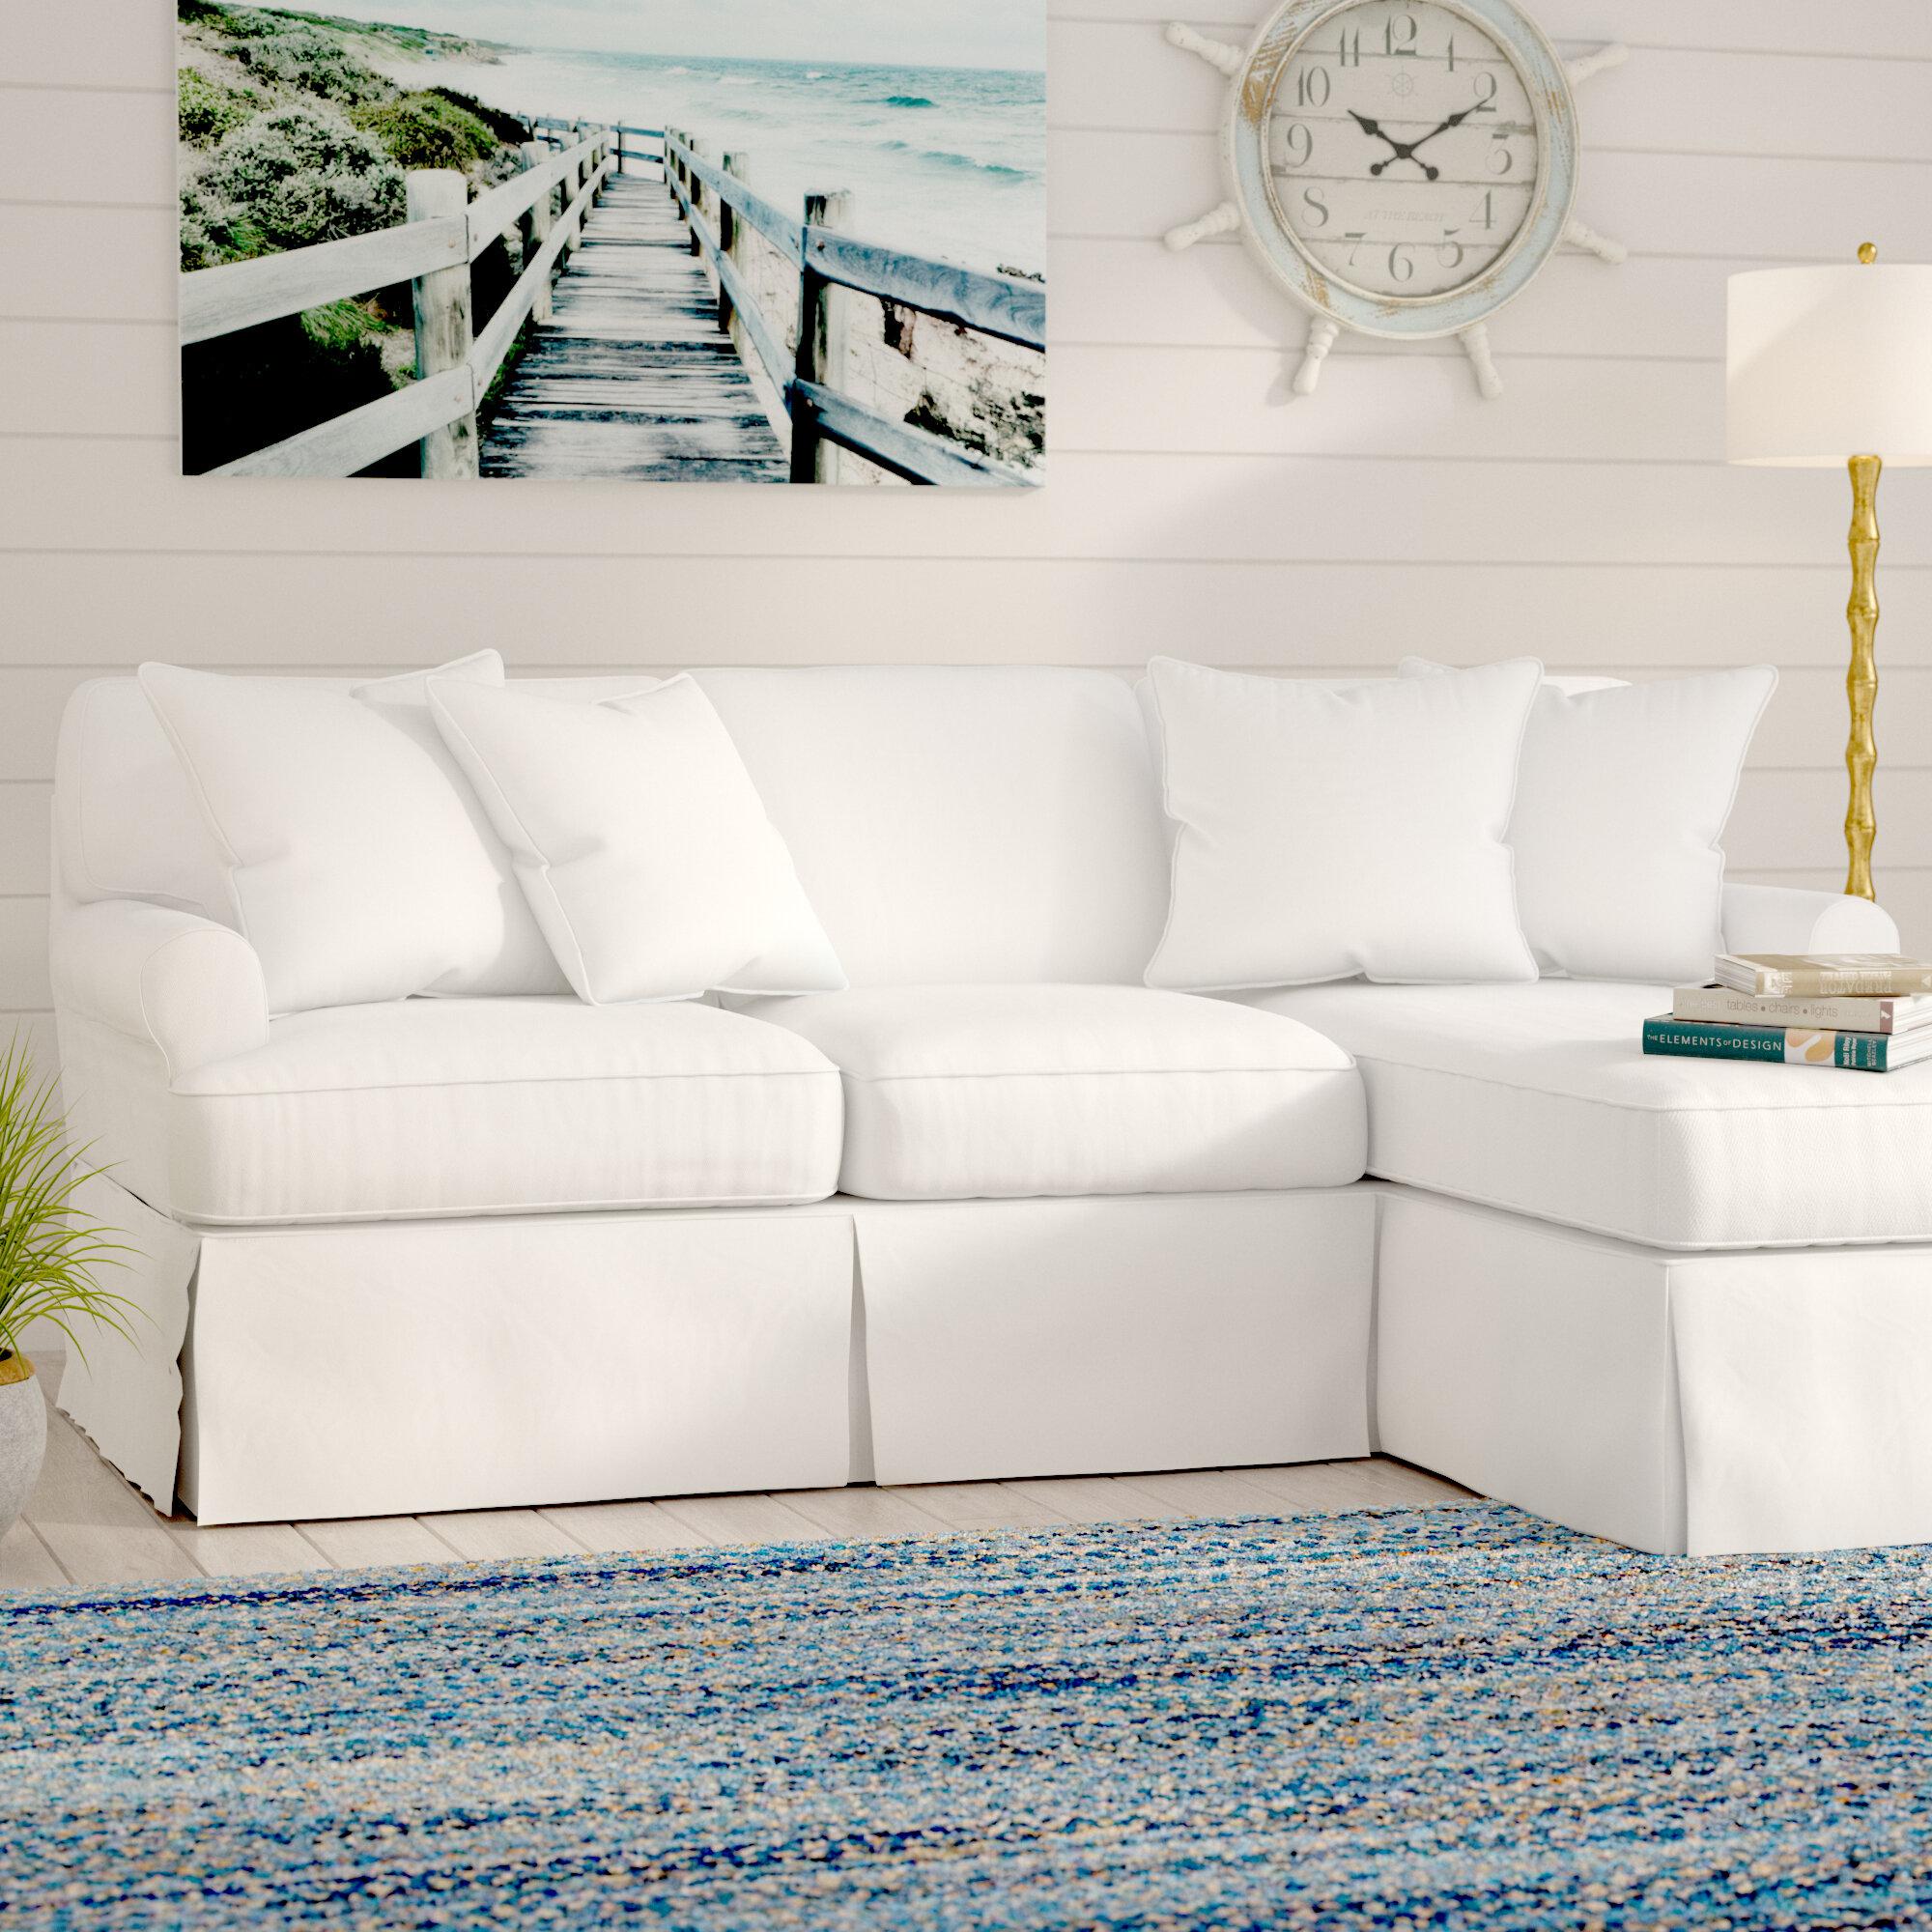 Beachcrest Home Coral Gables T-Cushion Sofa Slipcover Set | Wayfair